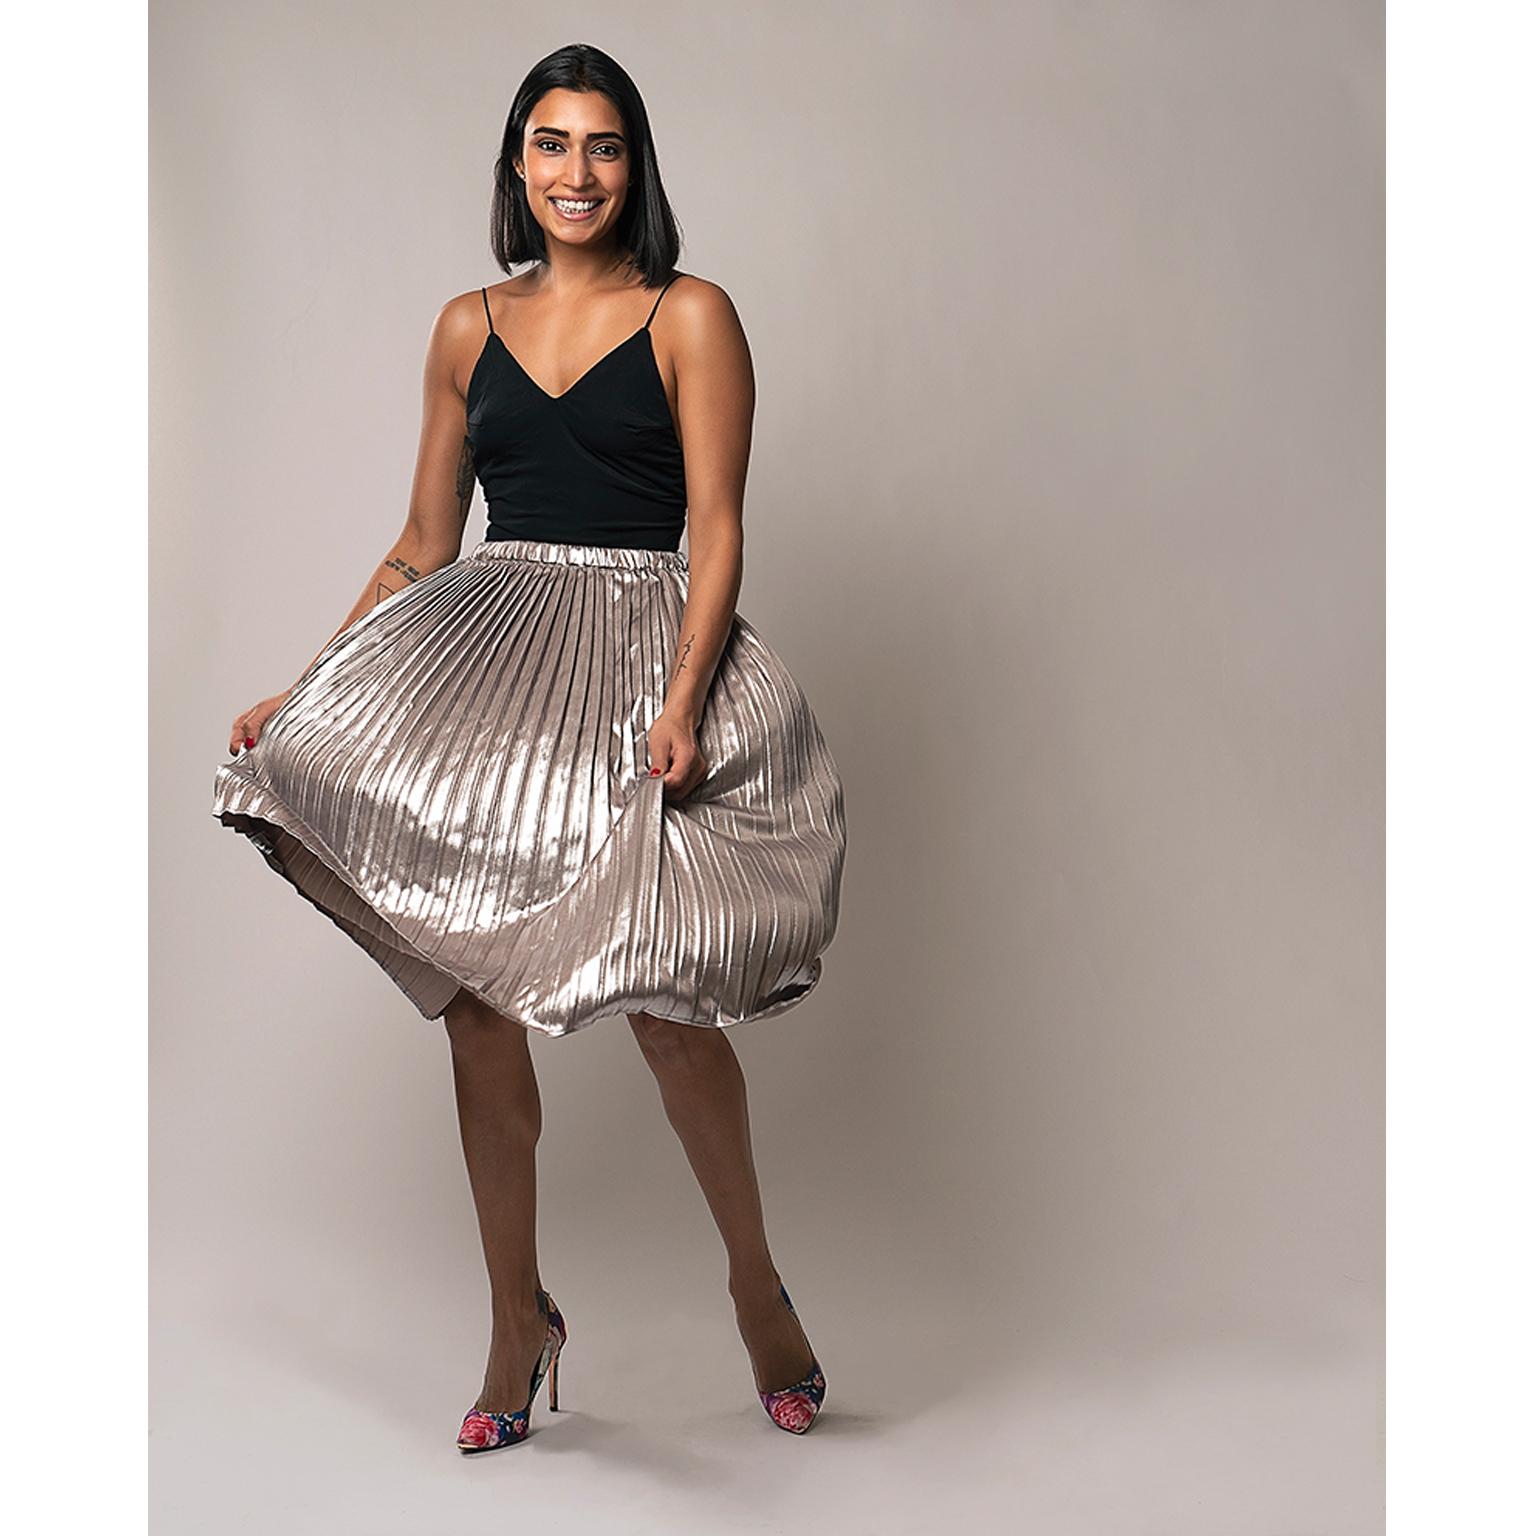 Toronto-Fitness-Model-Agency-Fashion-Sabrina-Virdee